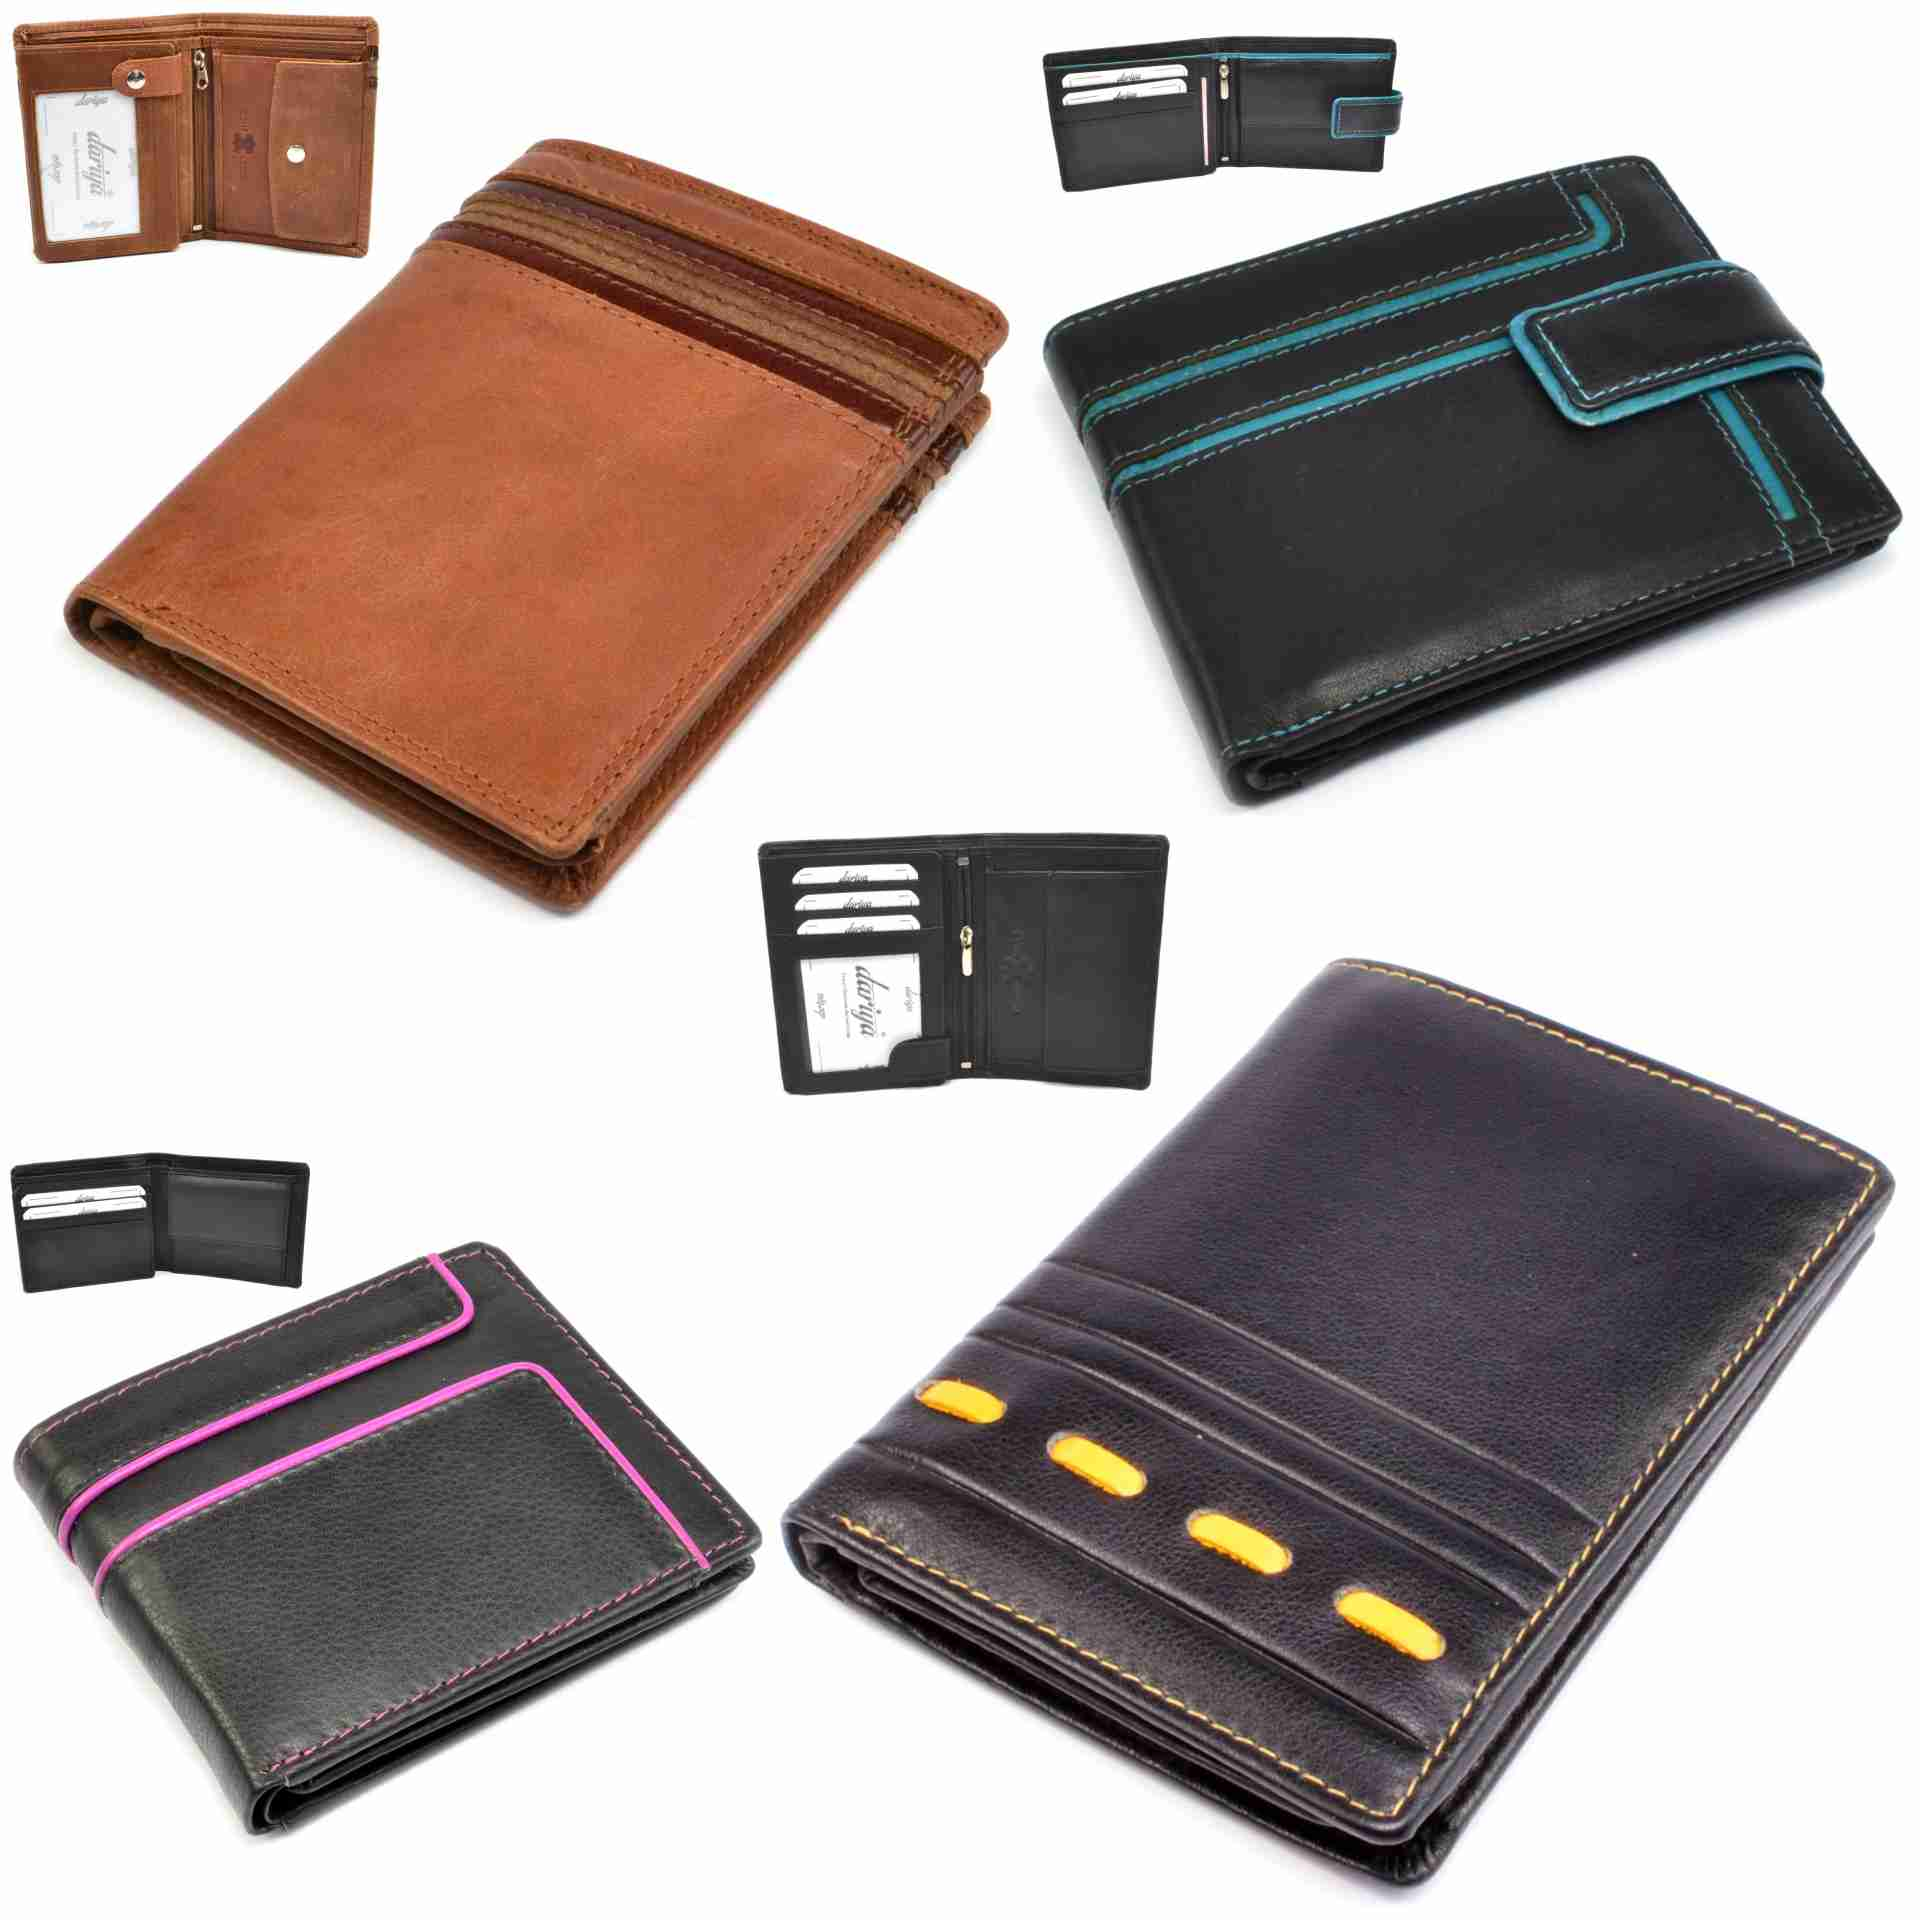 Pánské peněženky Dariya